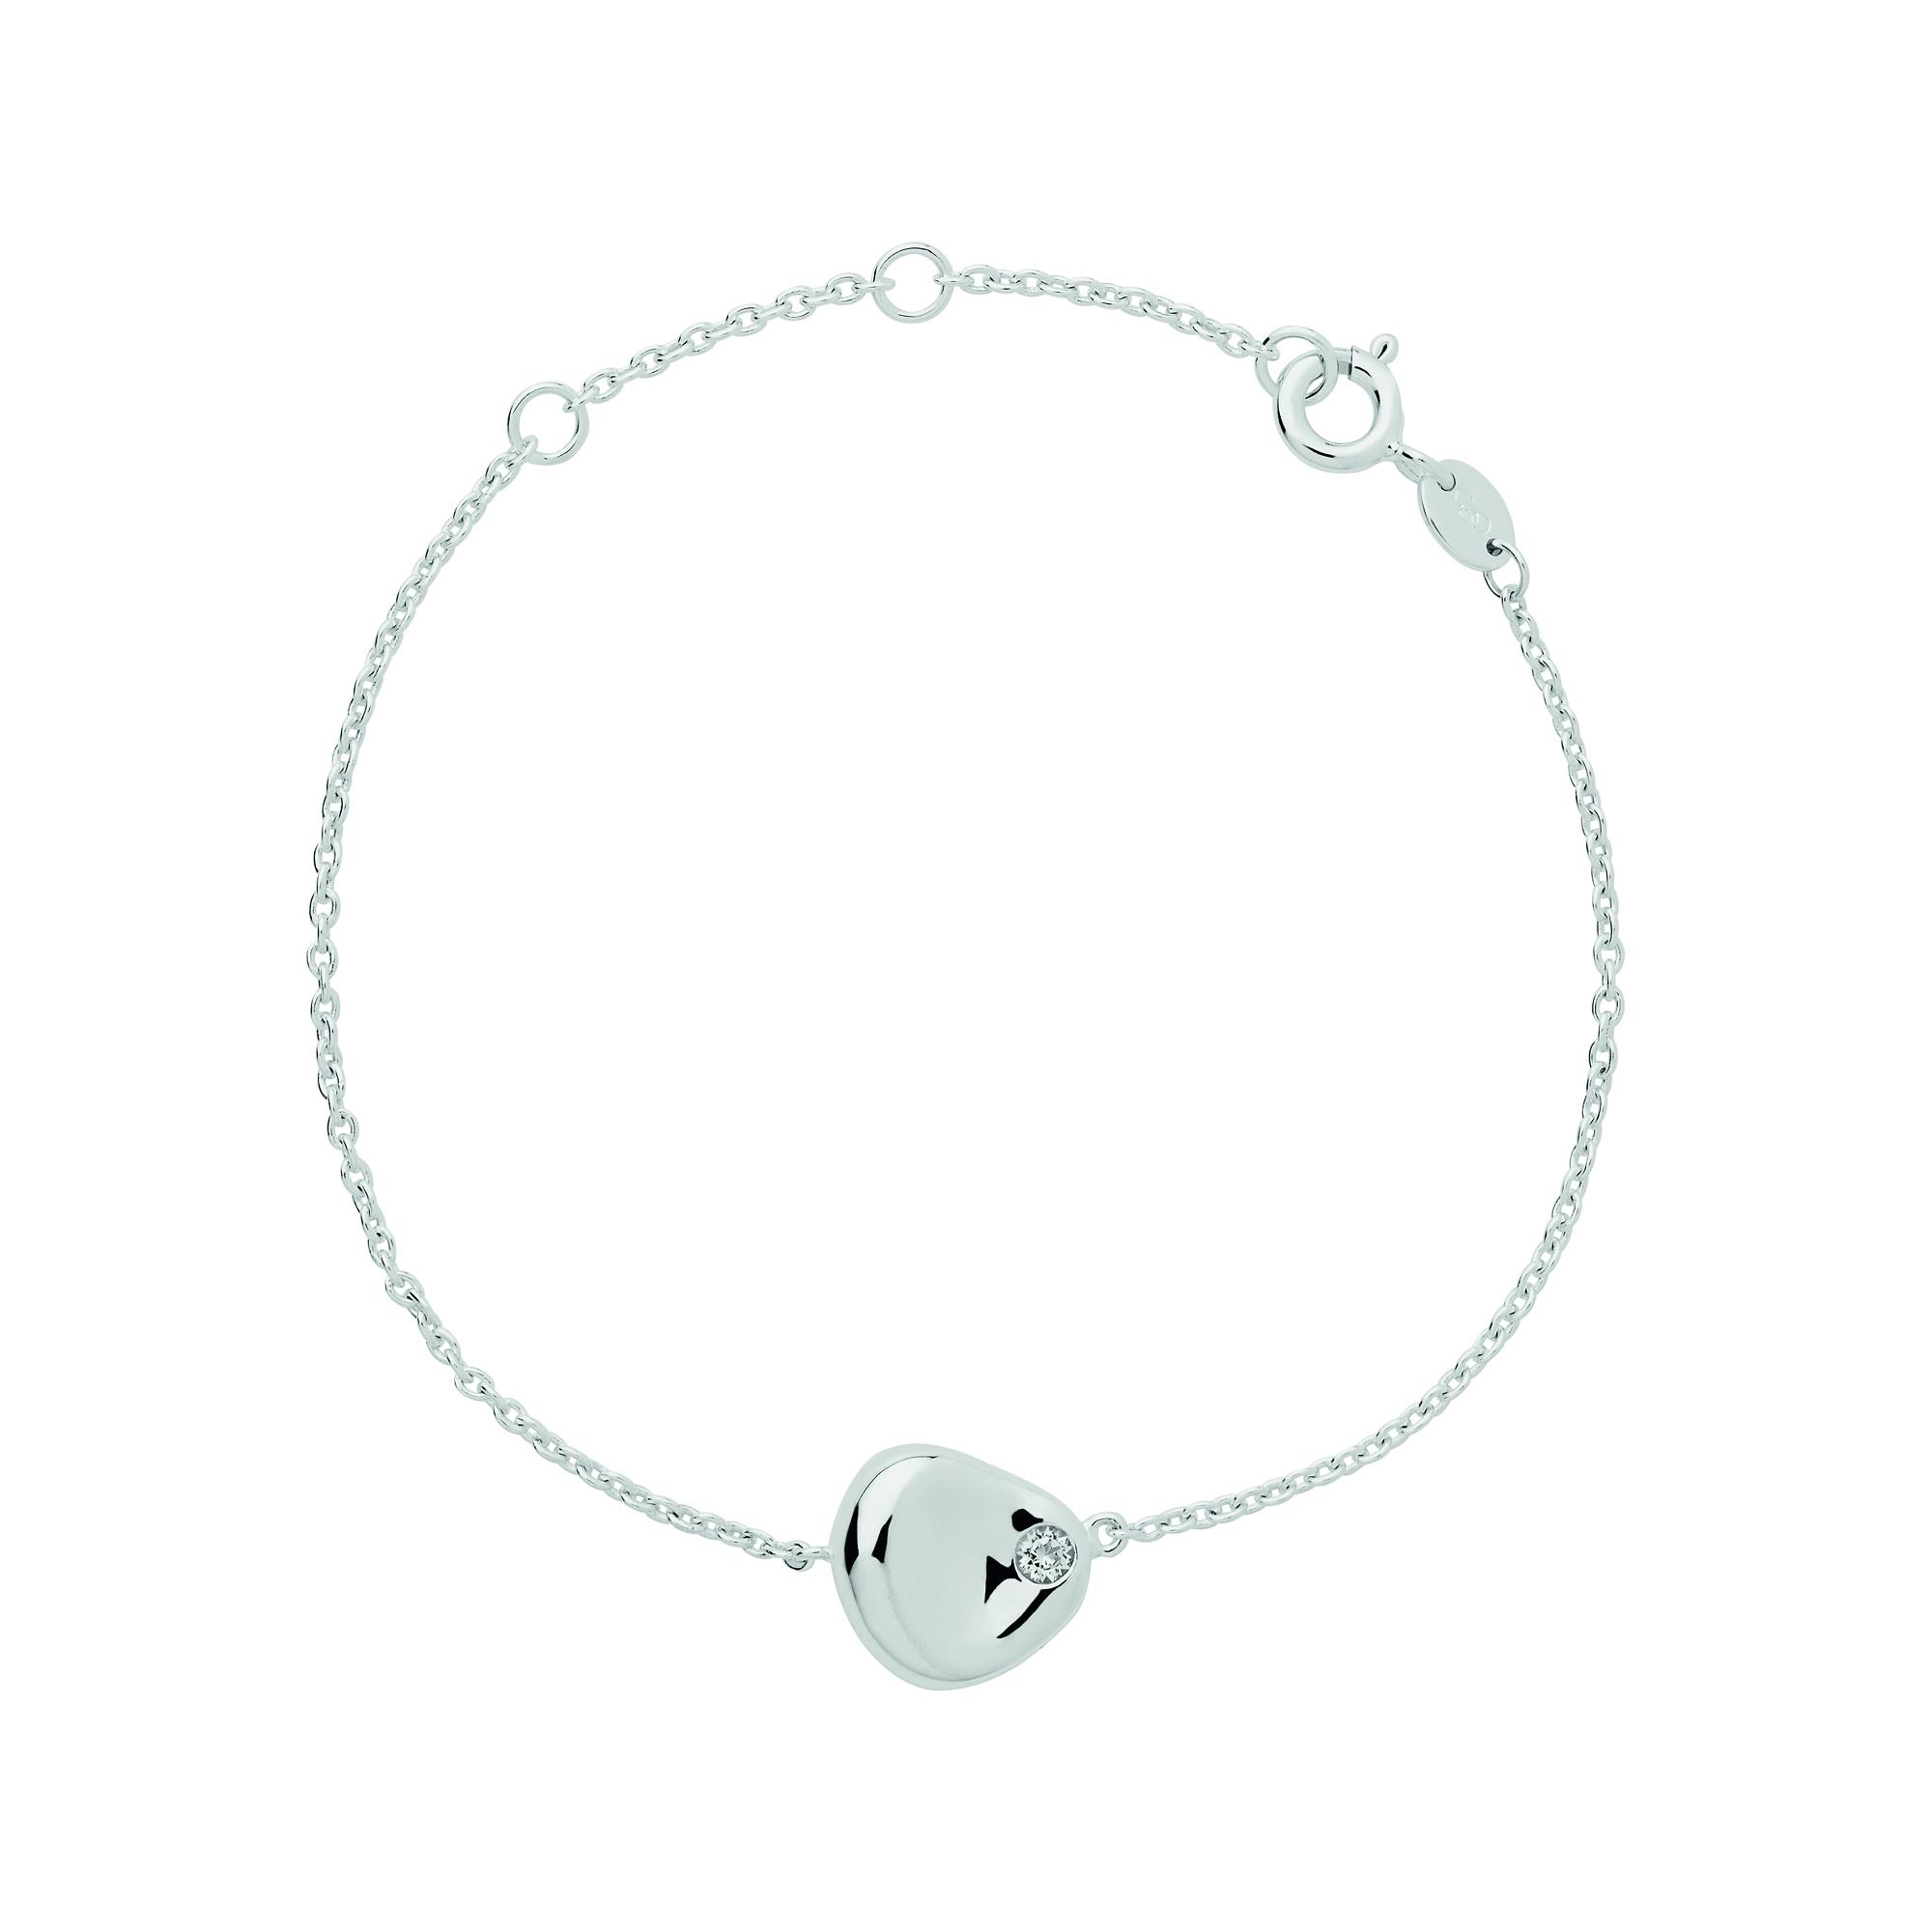 LINKS OF LONDON - Γυναικείο βραχιόλι LINKS OF LONDON Outlet Pebbles ασημί γυναικεία αξεσουάρ κοσμήματα βραχιόλια